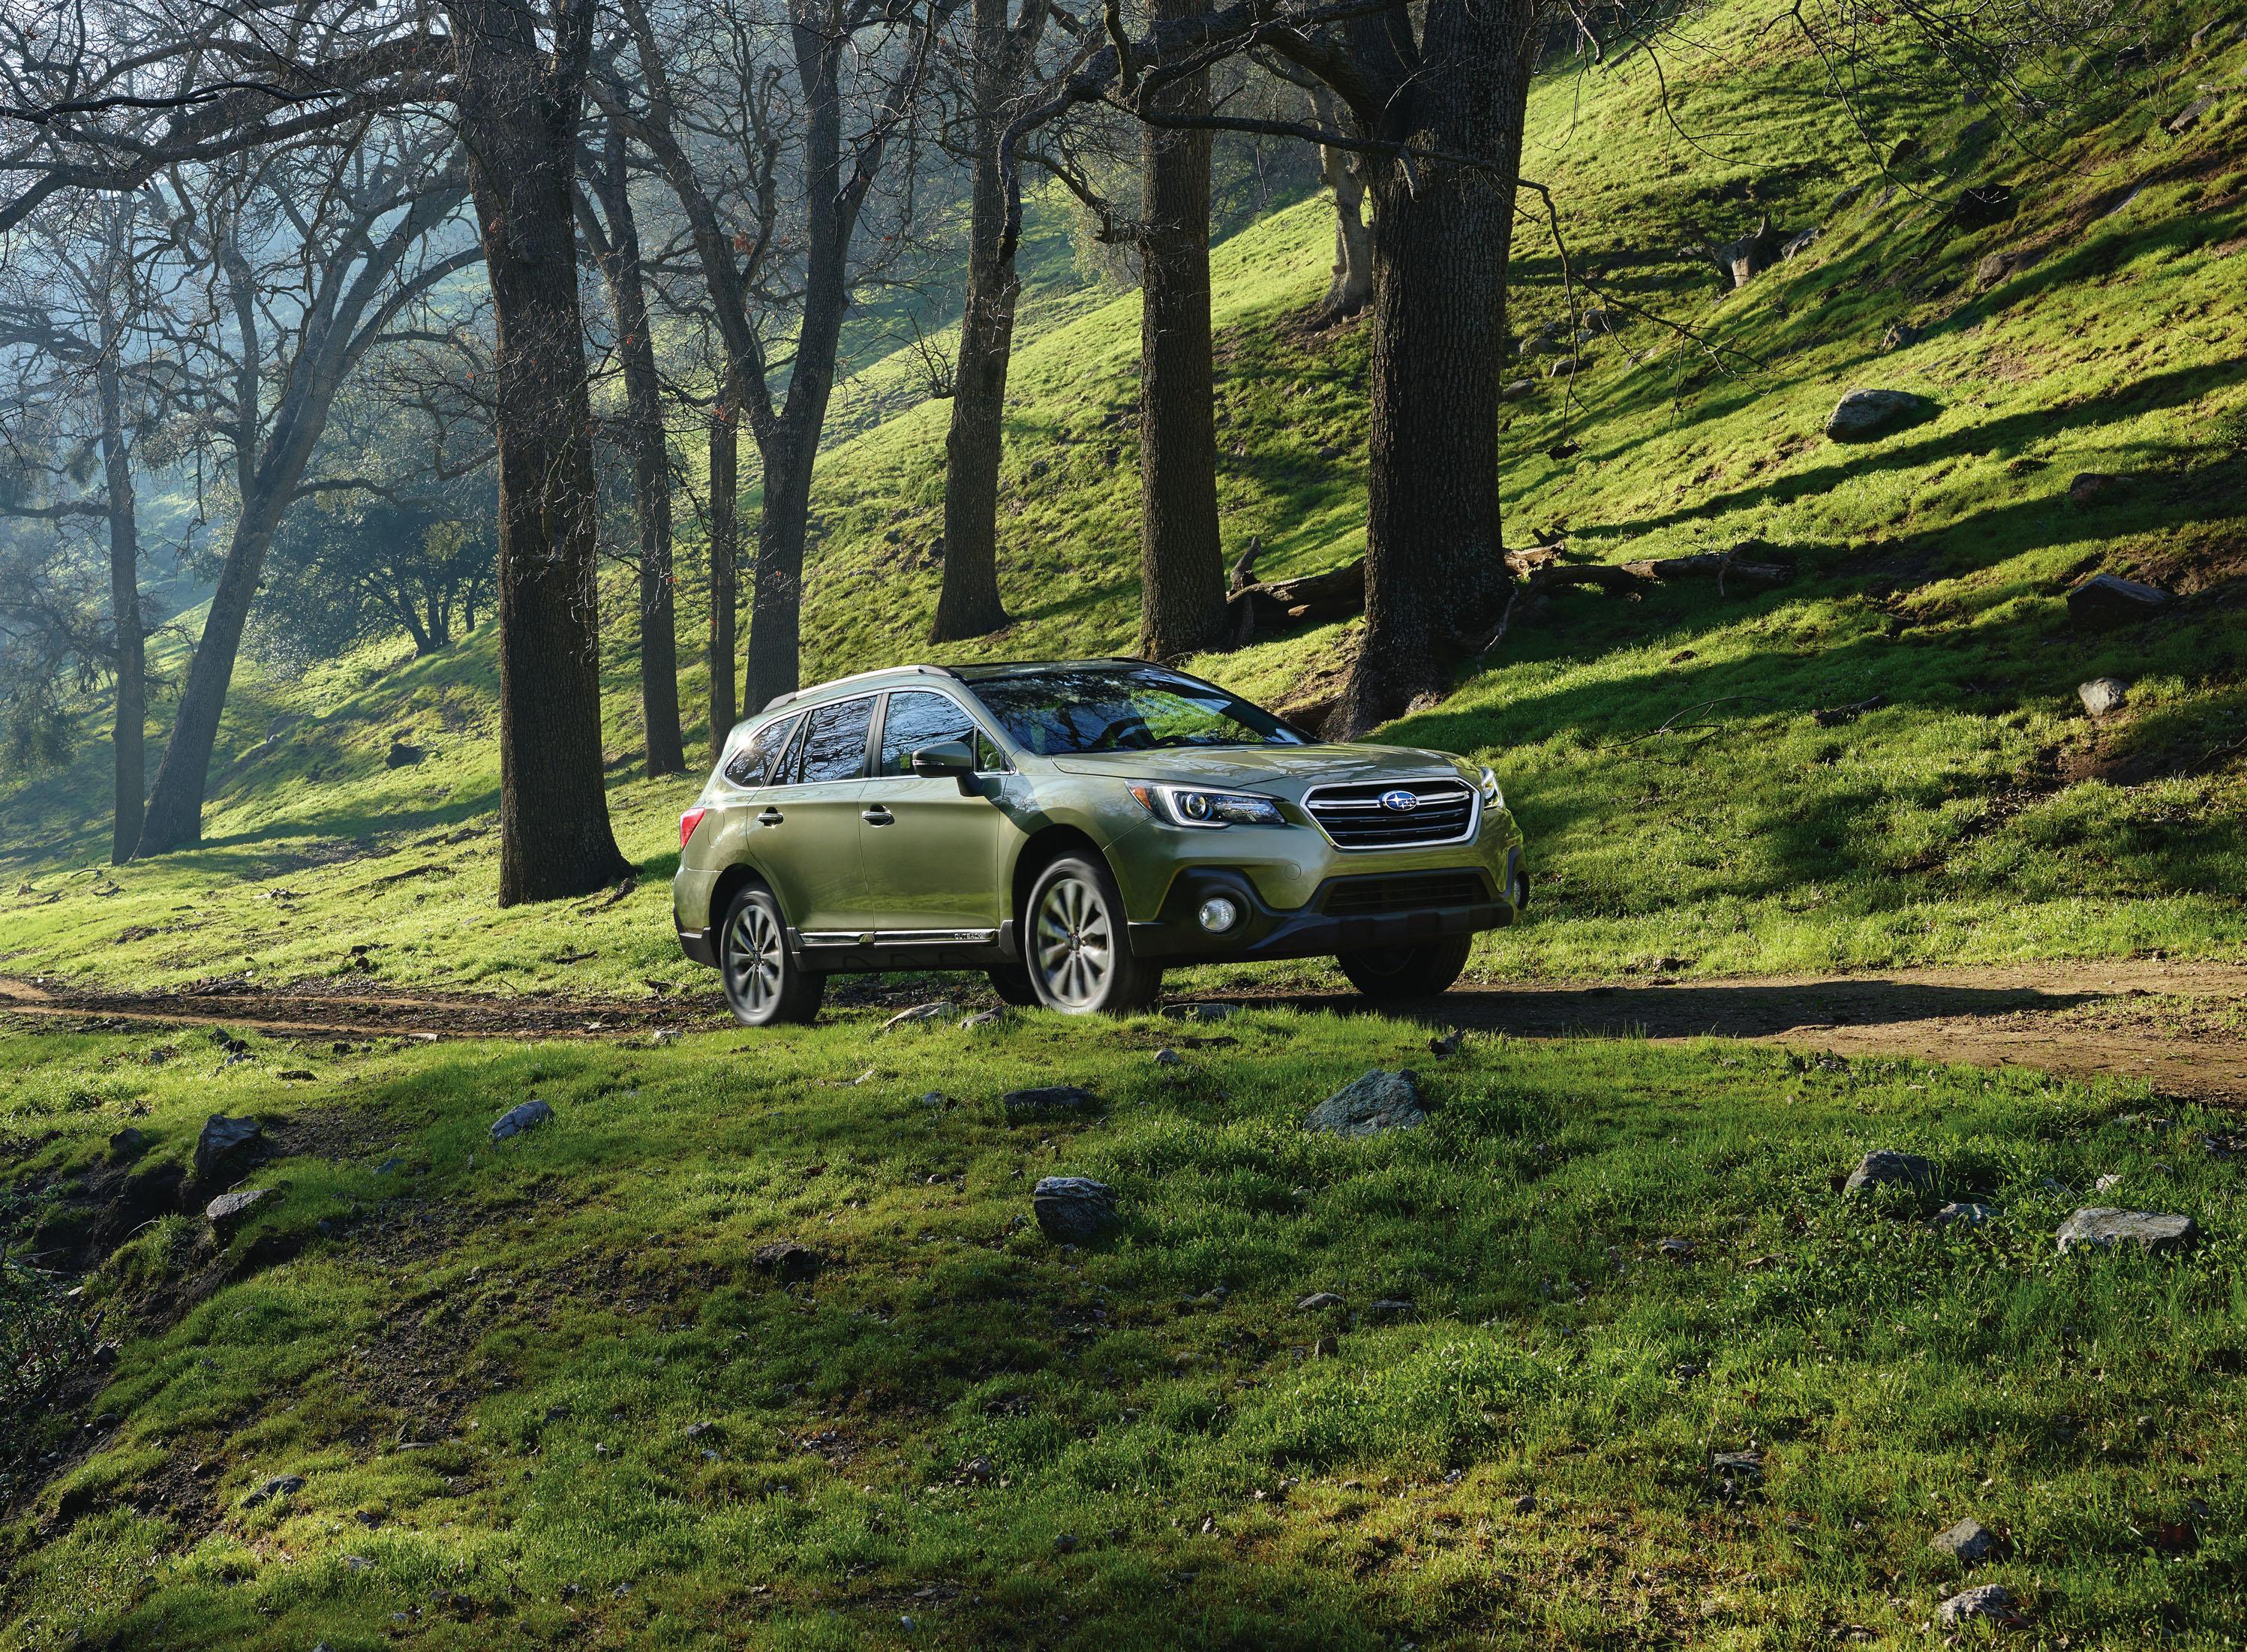 Crosstrek Vs Outback >> 2018 Subaru Outback Vs 2018 Subaru Crosstrek Compare Cars